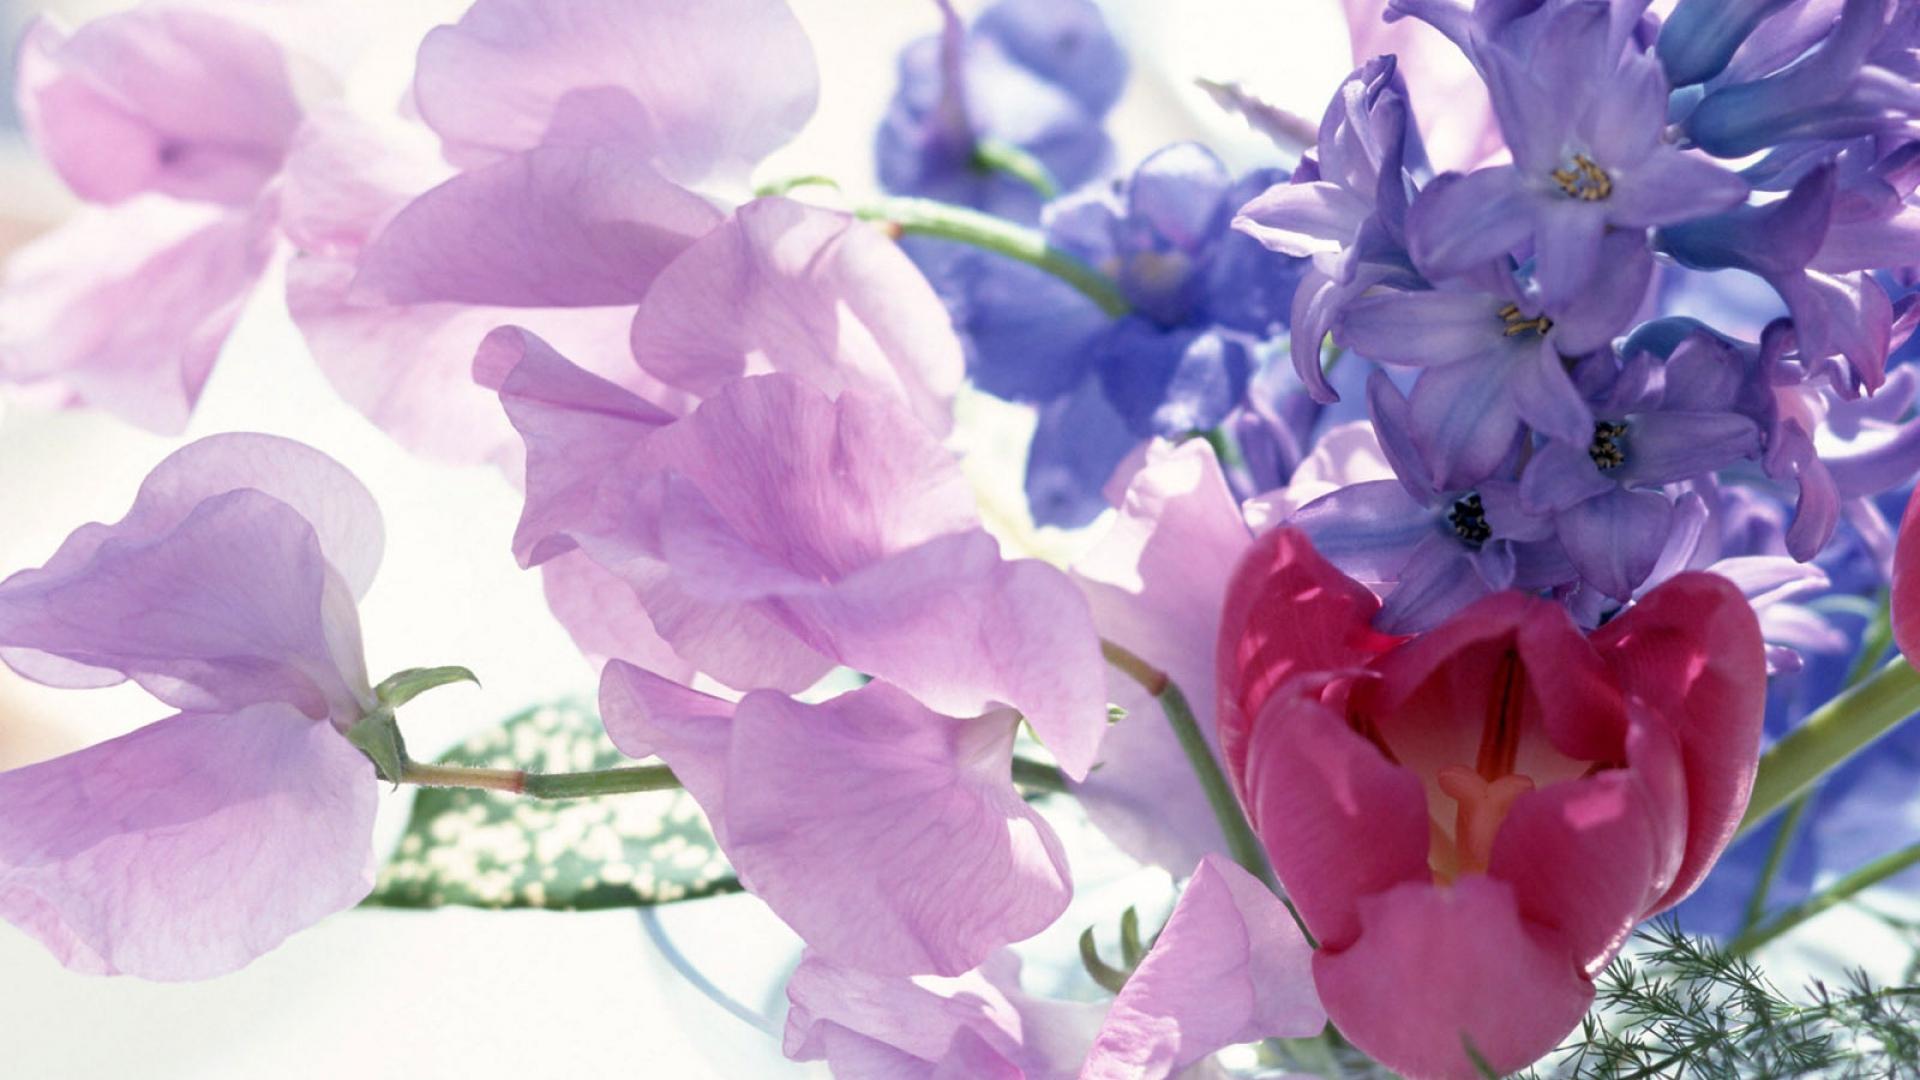 Download Wallpaper 1920x1080 Tulip Flower Song Pialat Close Up